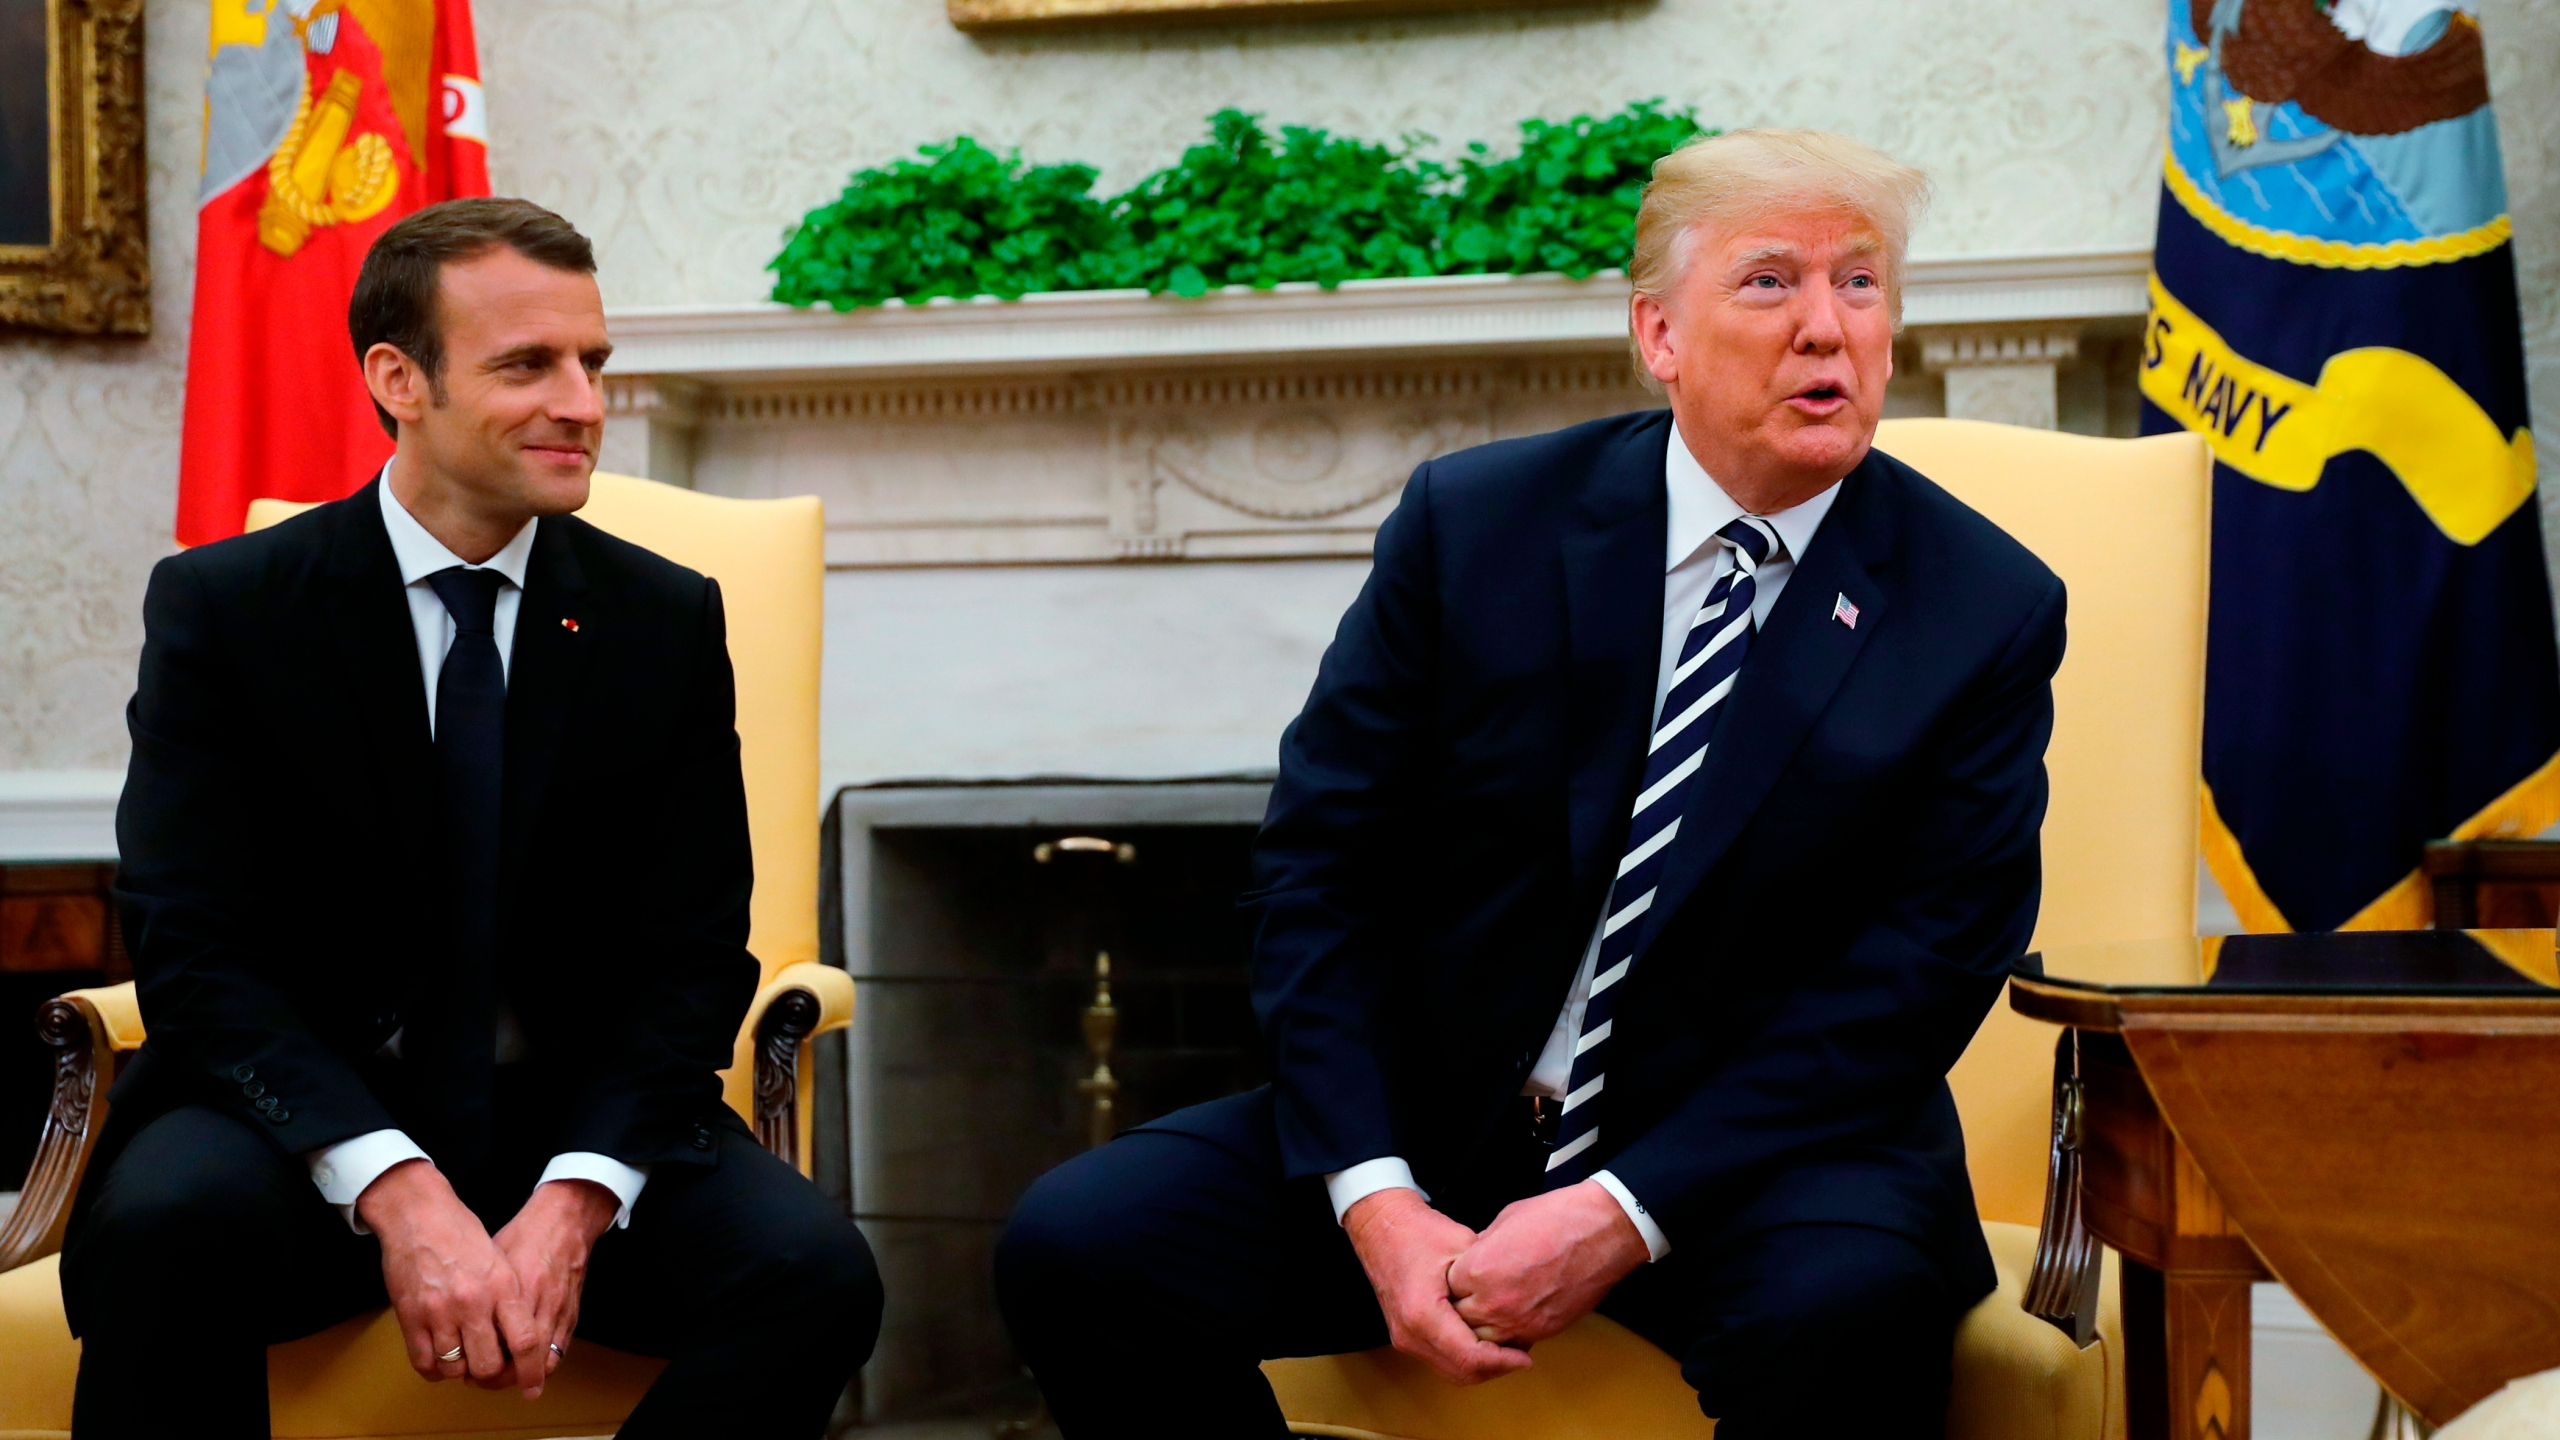 Trump_US_France_97637-159532.jpg31479202